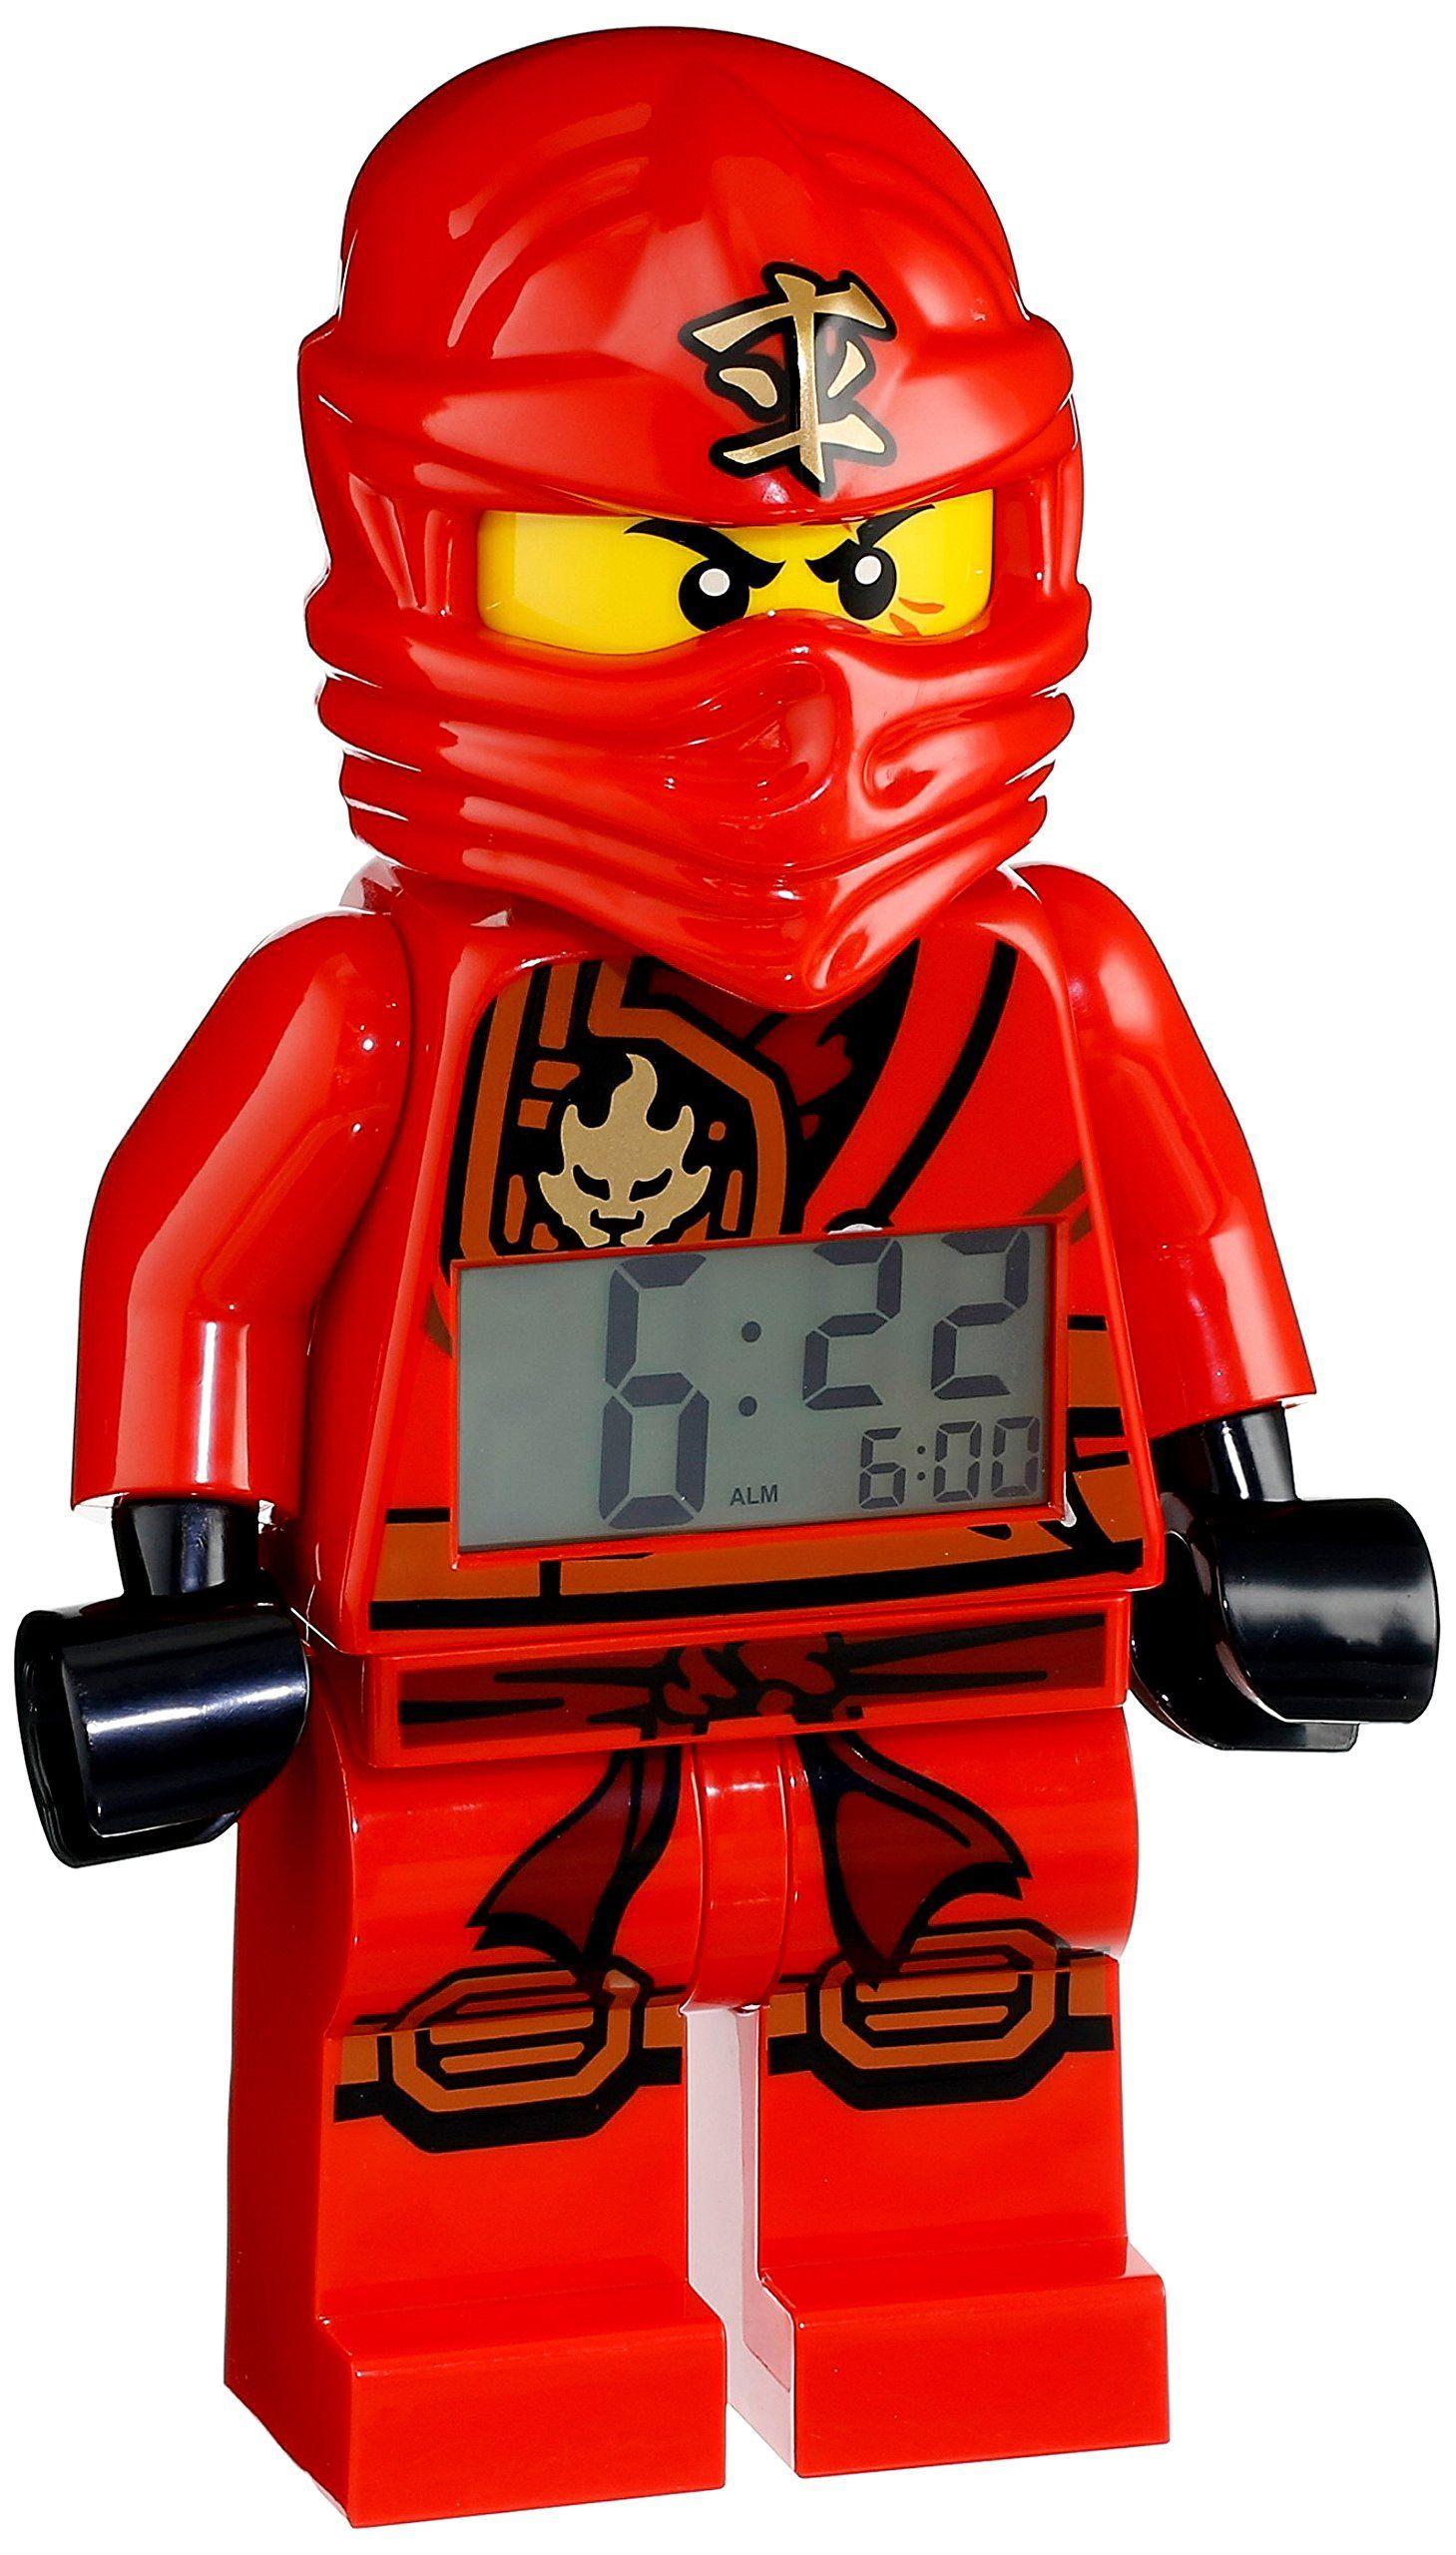 25 lego 9009600 ninjago jungle kai digital alarm clock